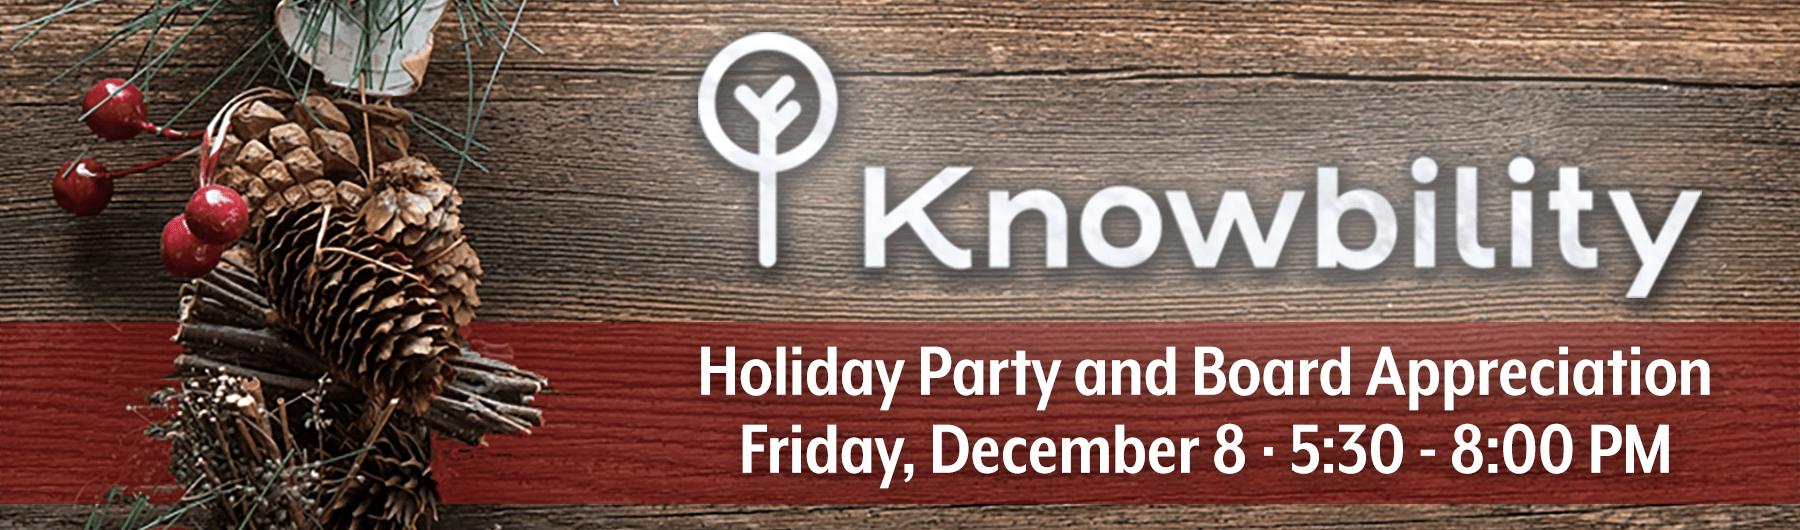 Knowbility Board Appreciation & Holiday Party 2017